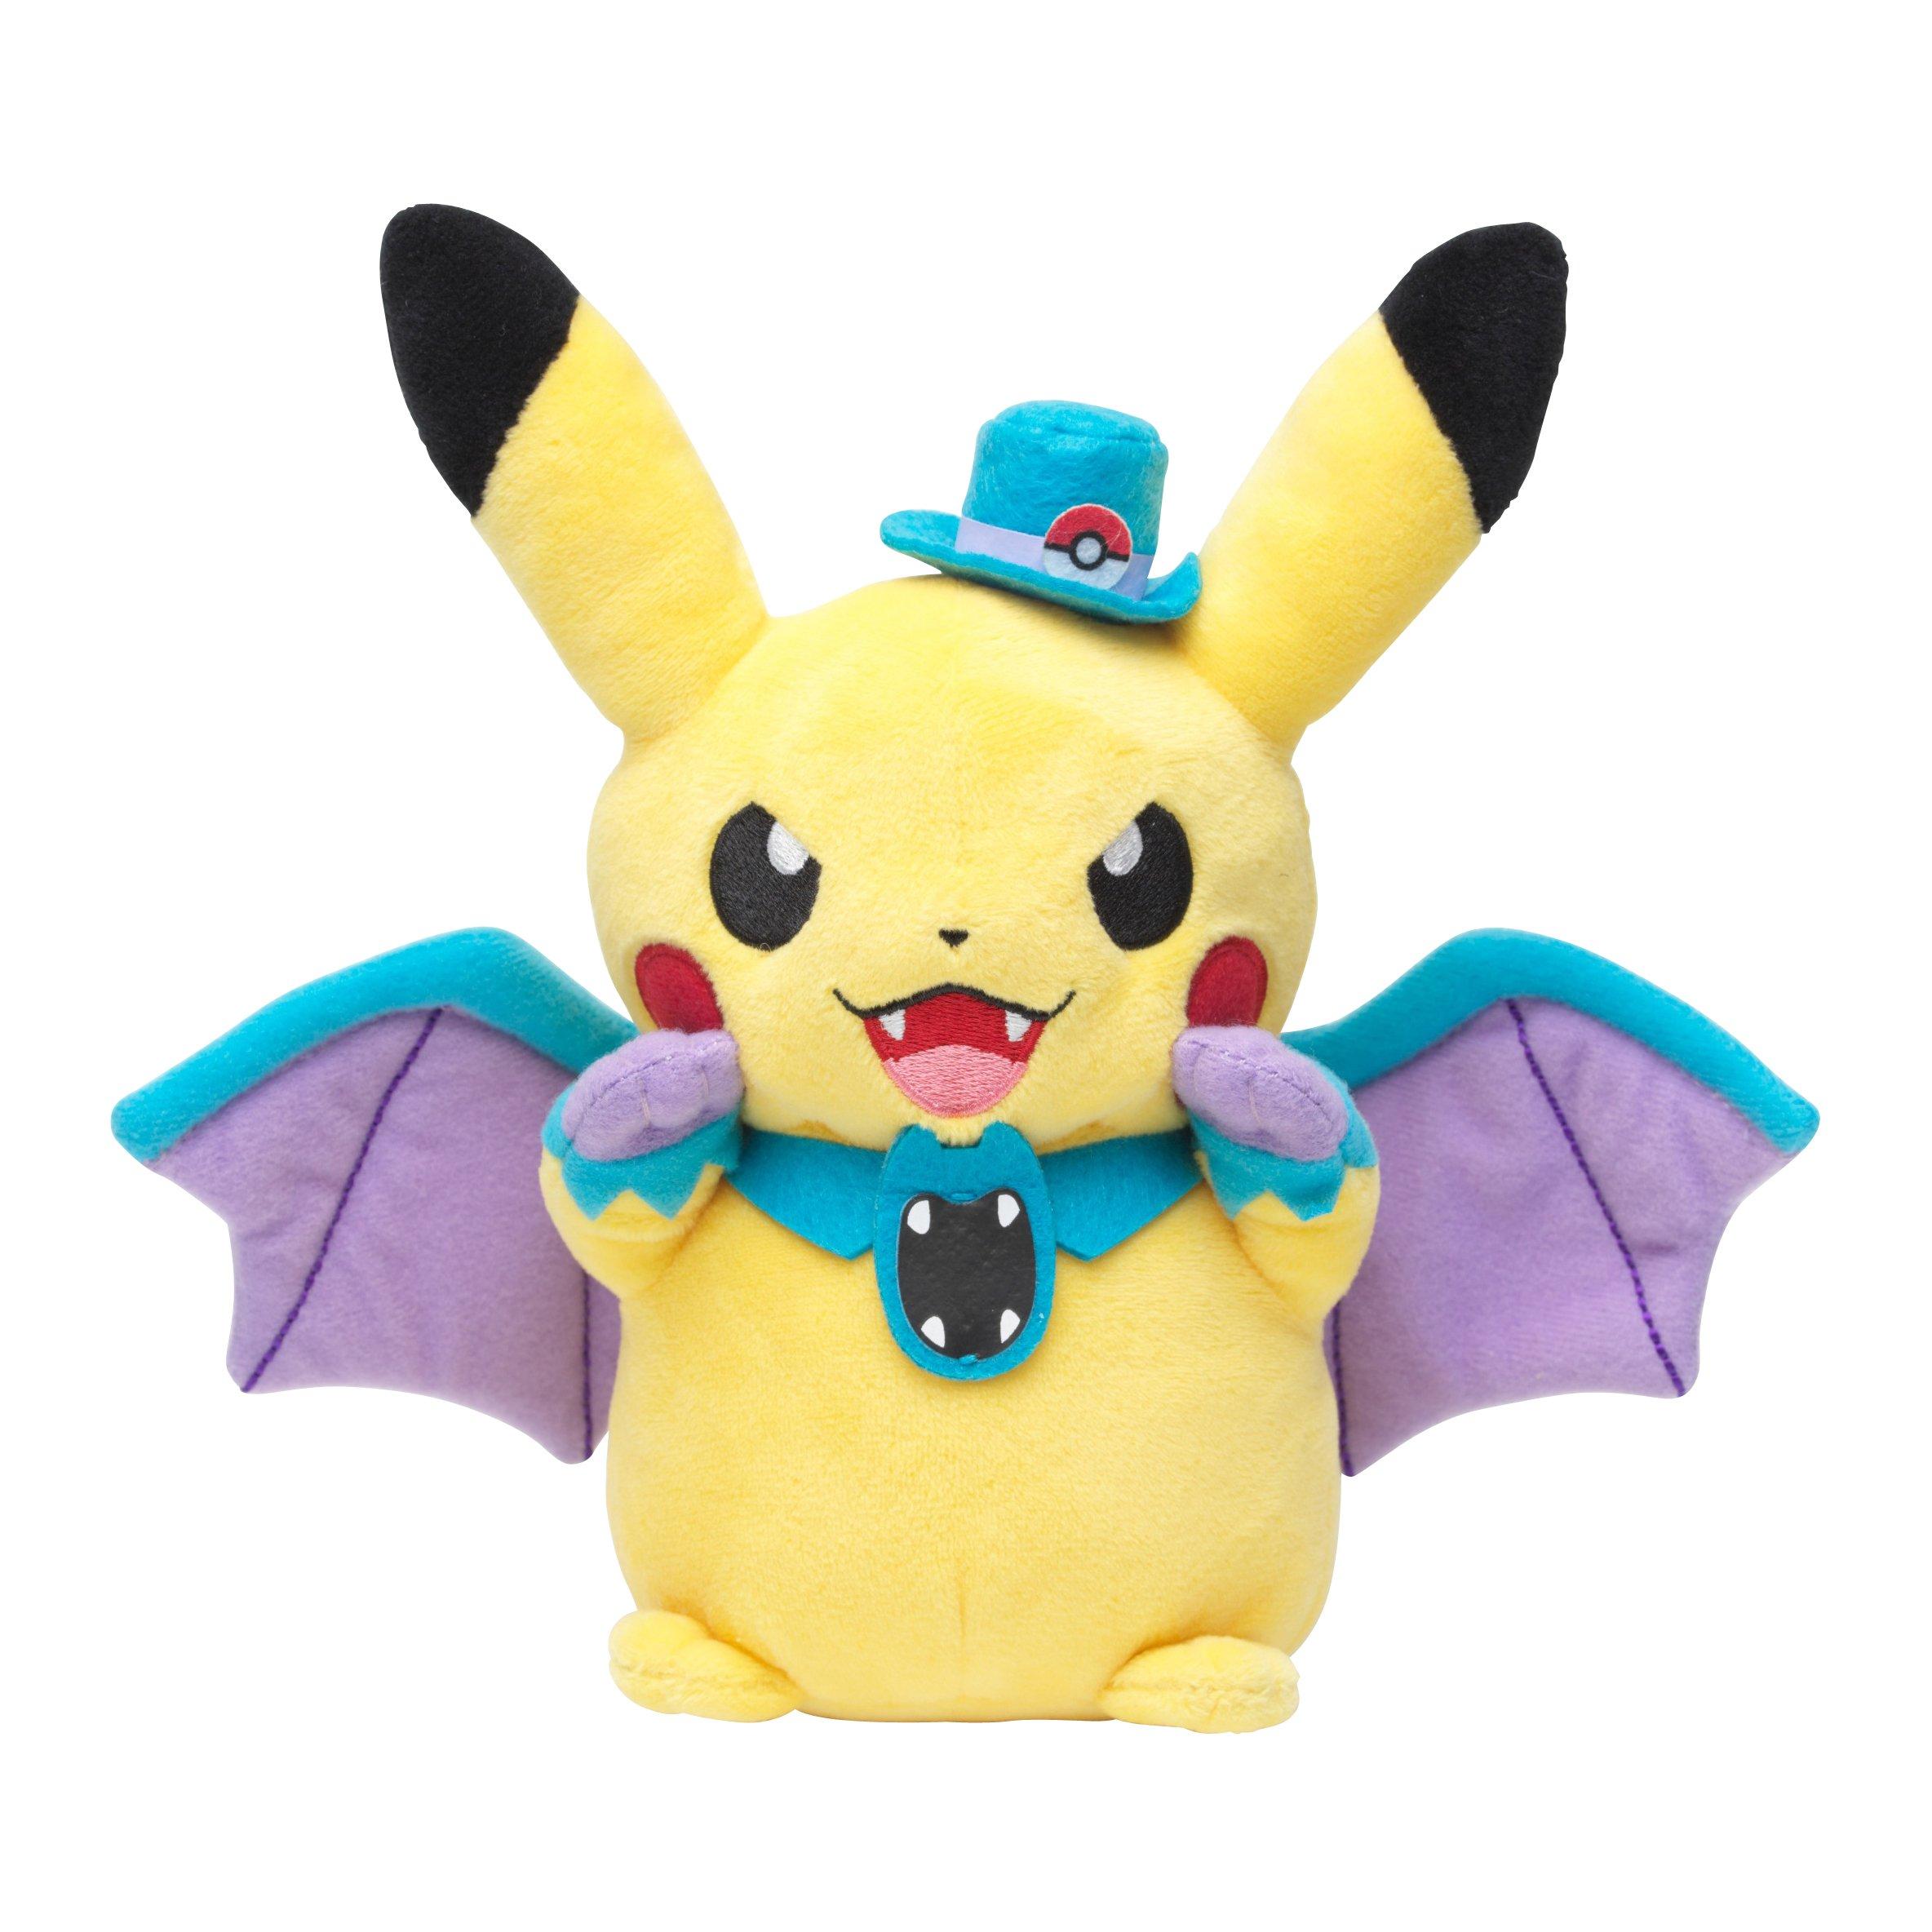 Pokemon Center Original Pikachu Plush Doll (Golbat Ver.) Halloween Parade 2015